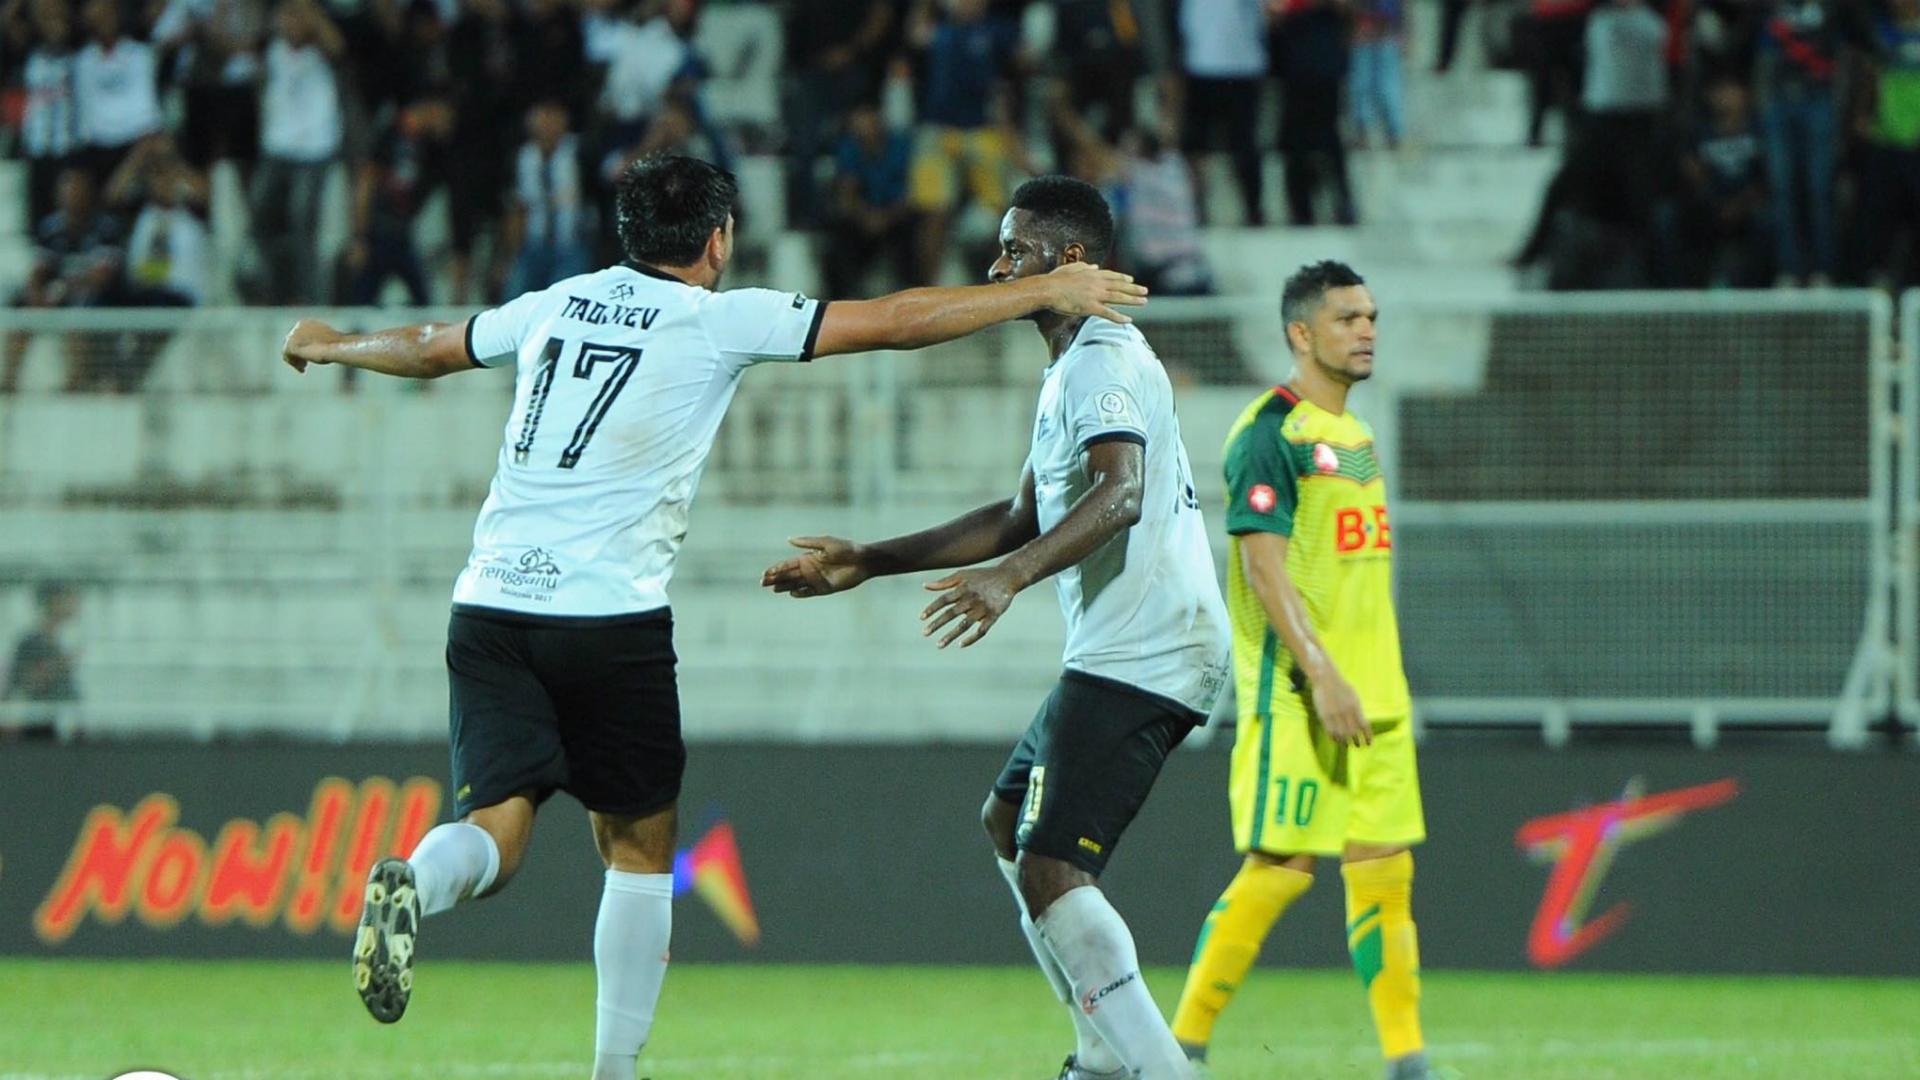 Farhod Tadjiev, Mahamadou Samassa, T-Team, Sandro da Silva, Kedah, Super League, 15/04/2017